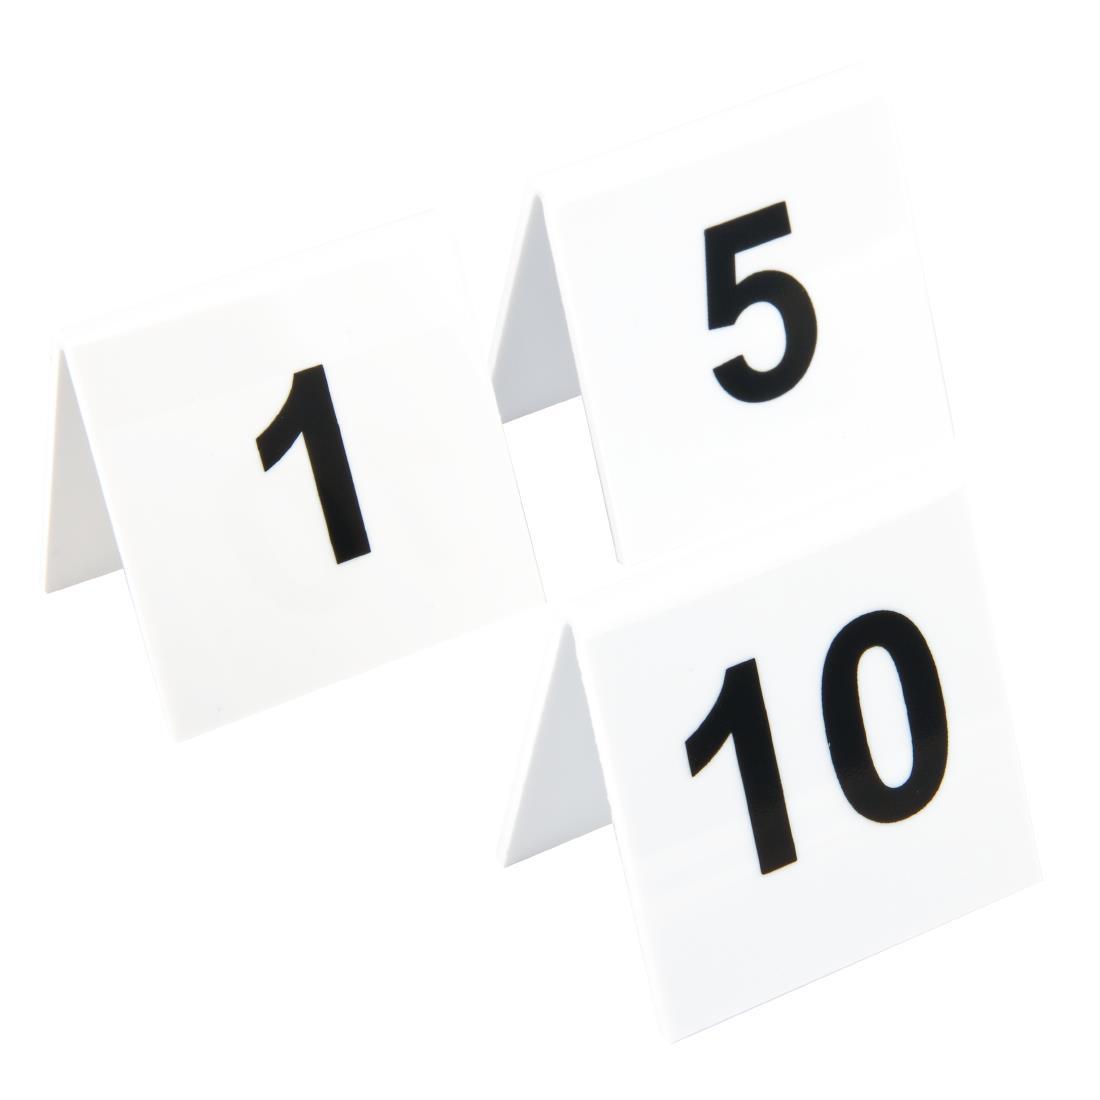 Plastic Table Numbers 1-10